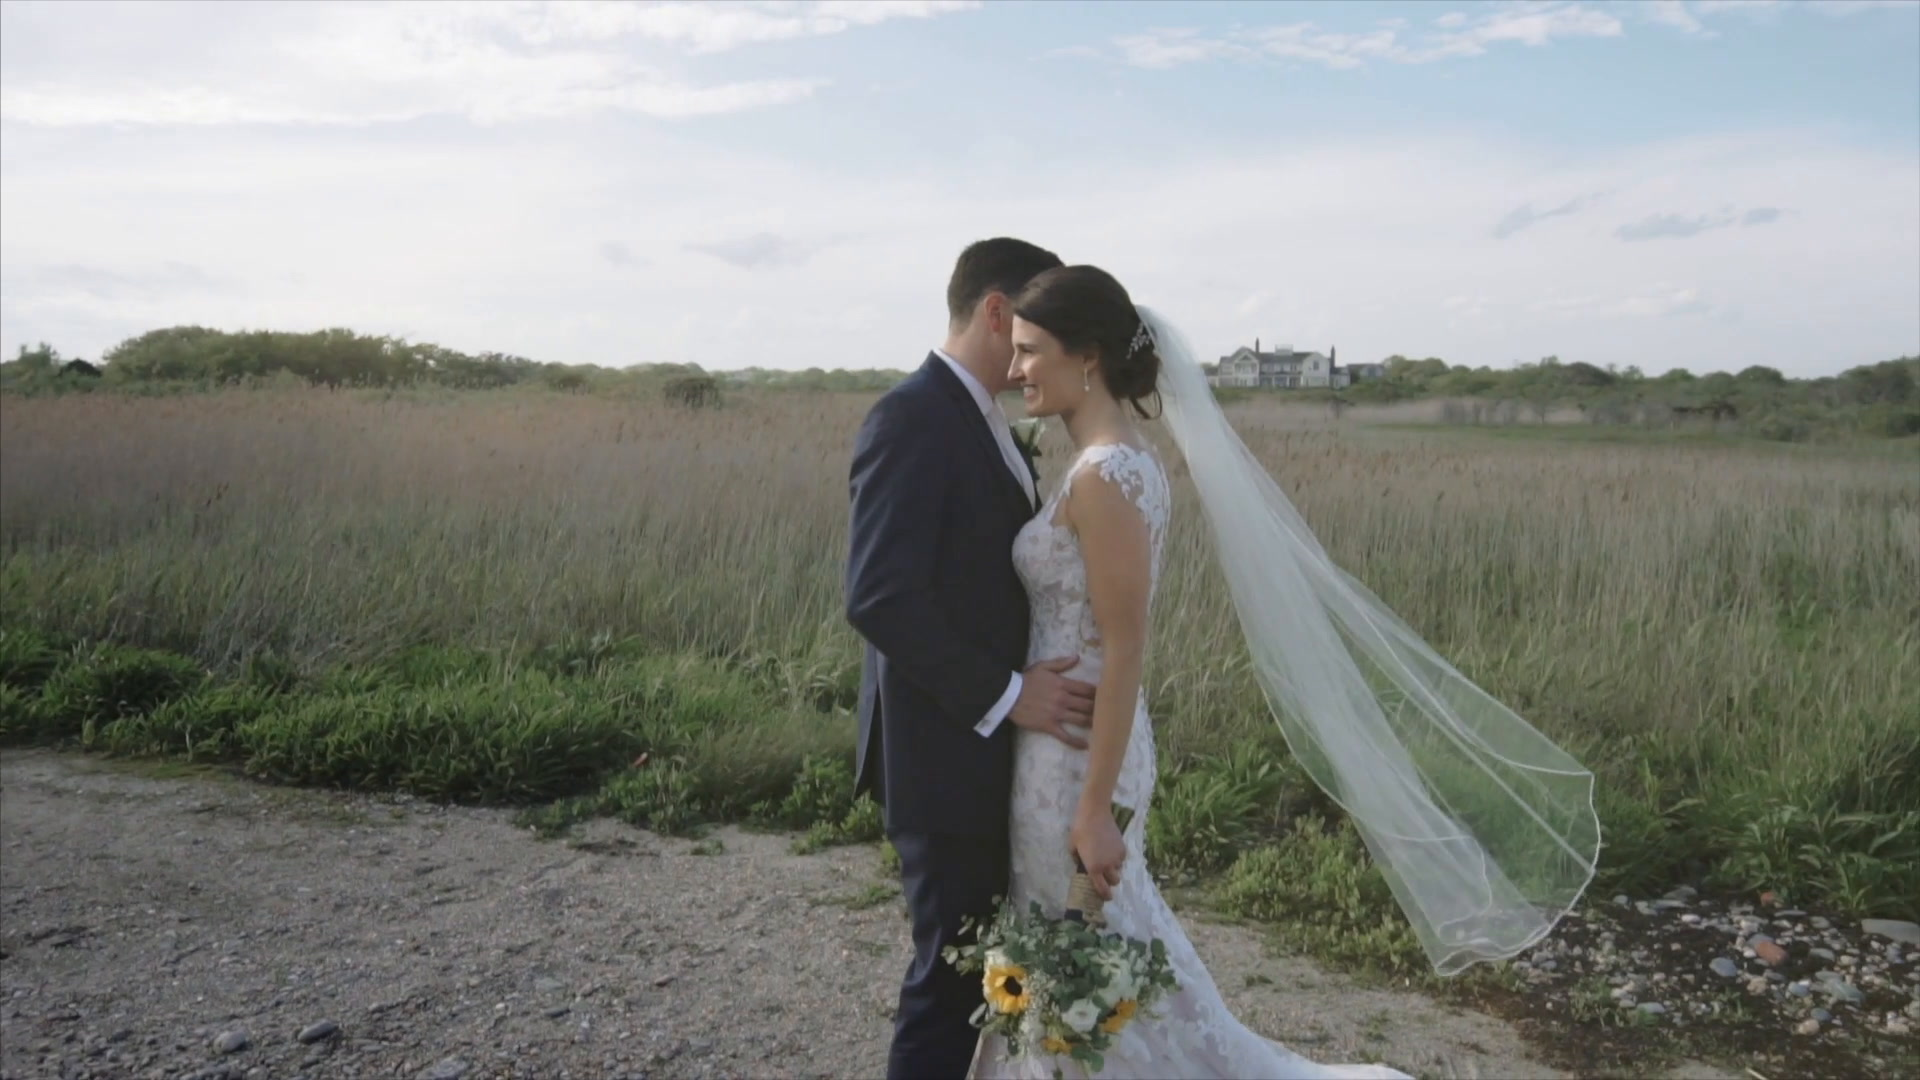 Christopher + Katherine | Newport, Rhode Island | The Bohlin